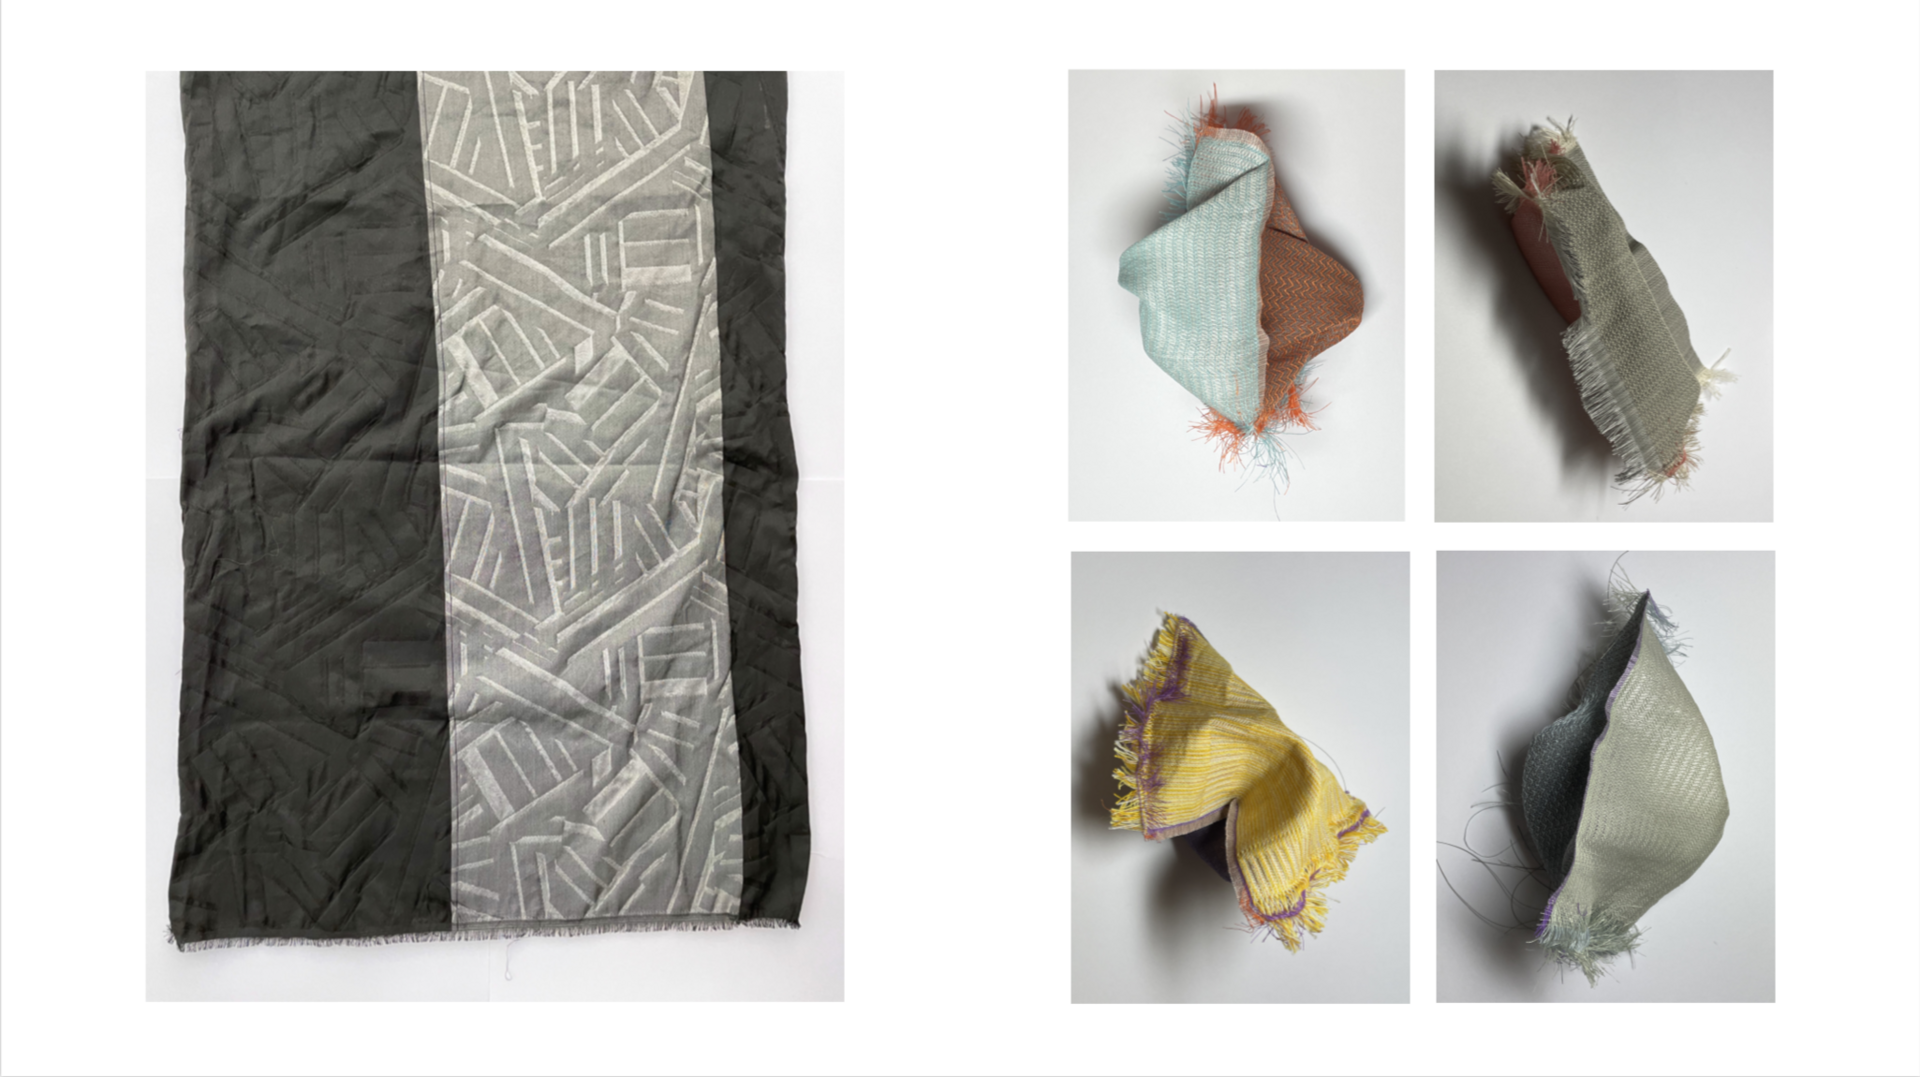 Jacquard sample (left)/Handwoven piece (right)